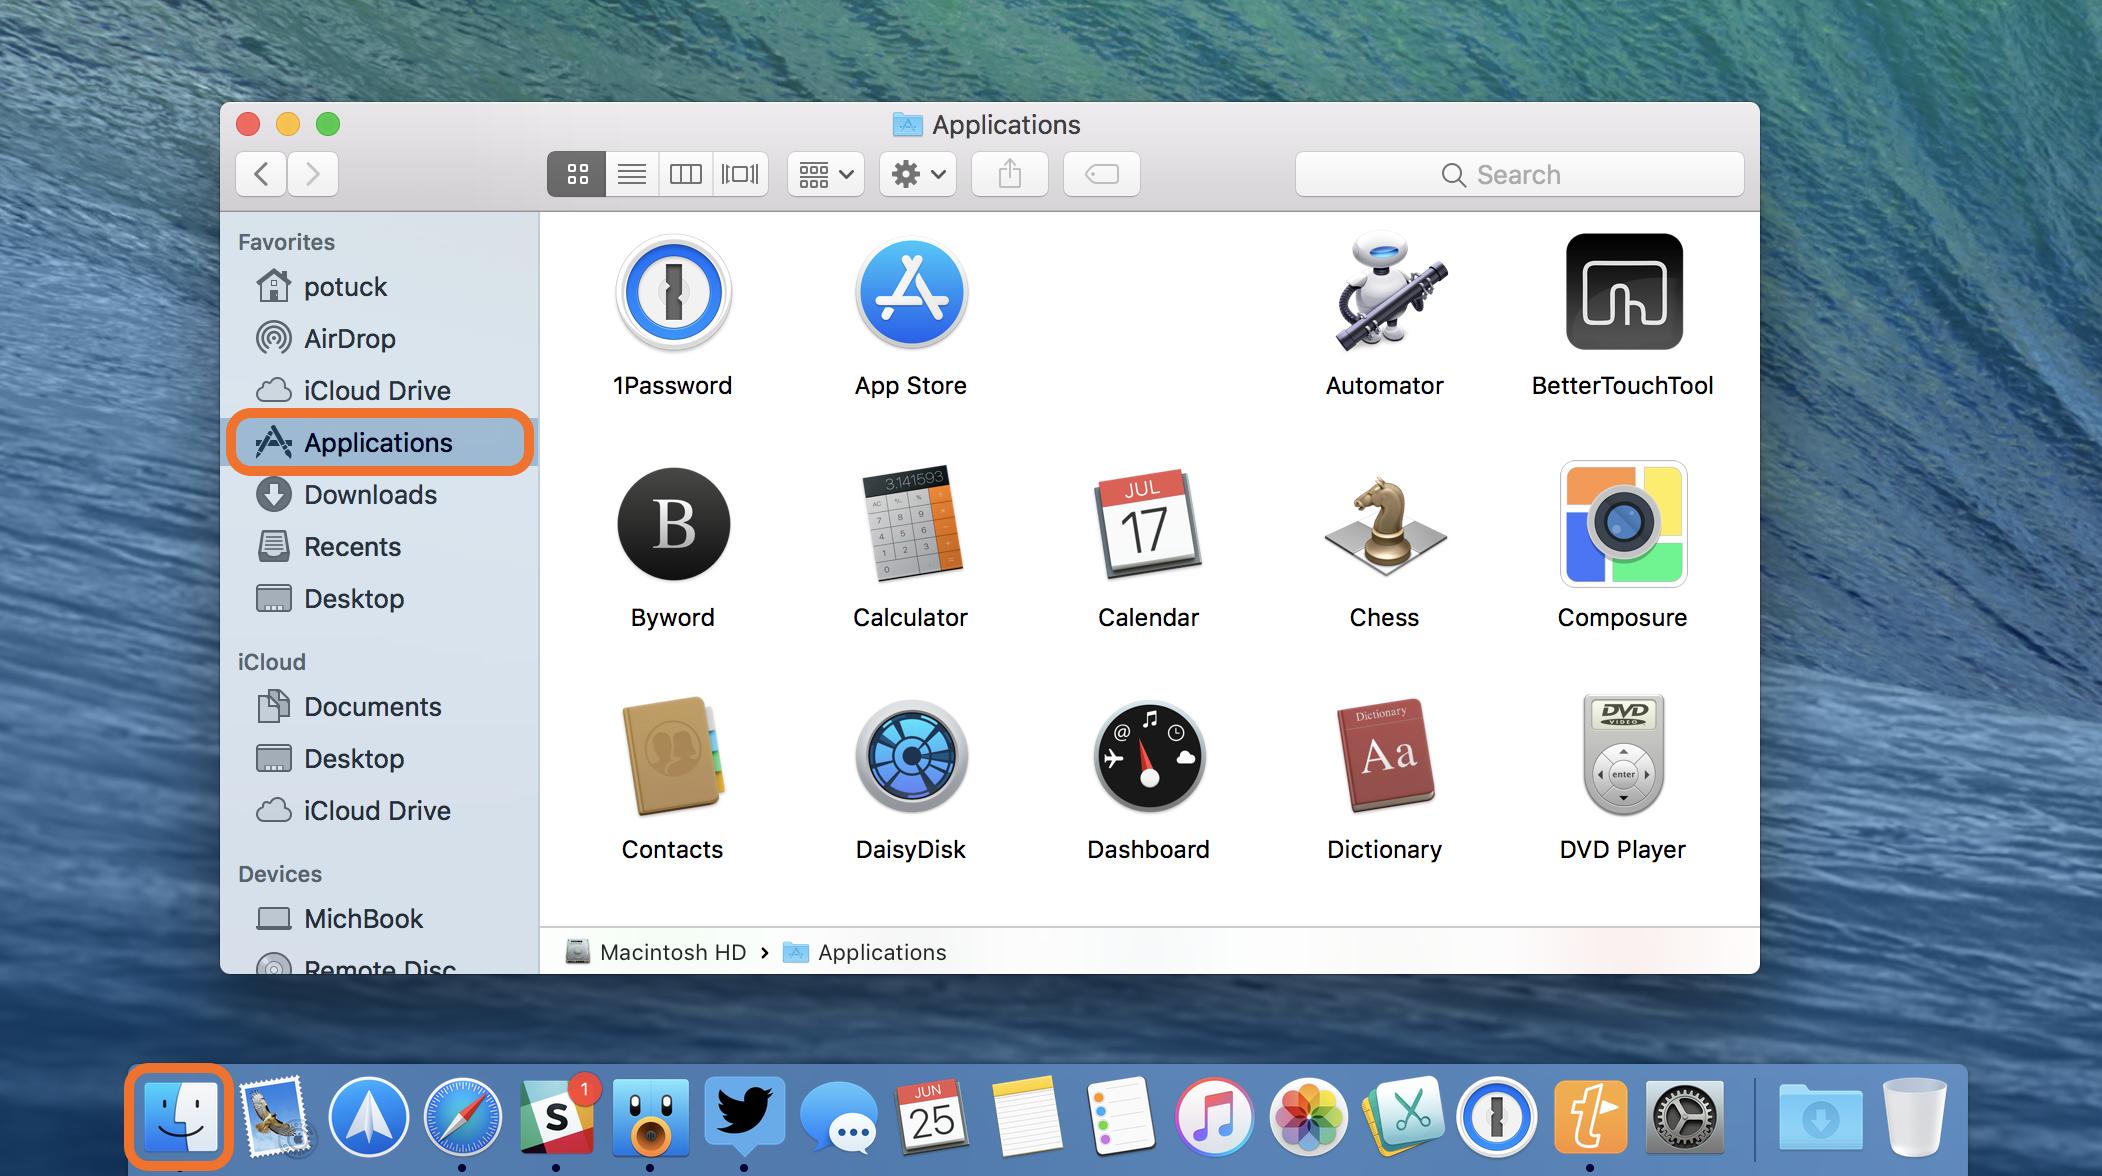 "<span href=""https://9to5mac.com/2018/06/25/mac-how-to-delete-apps/"">Mac: Cómo eliminar apps</a>"